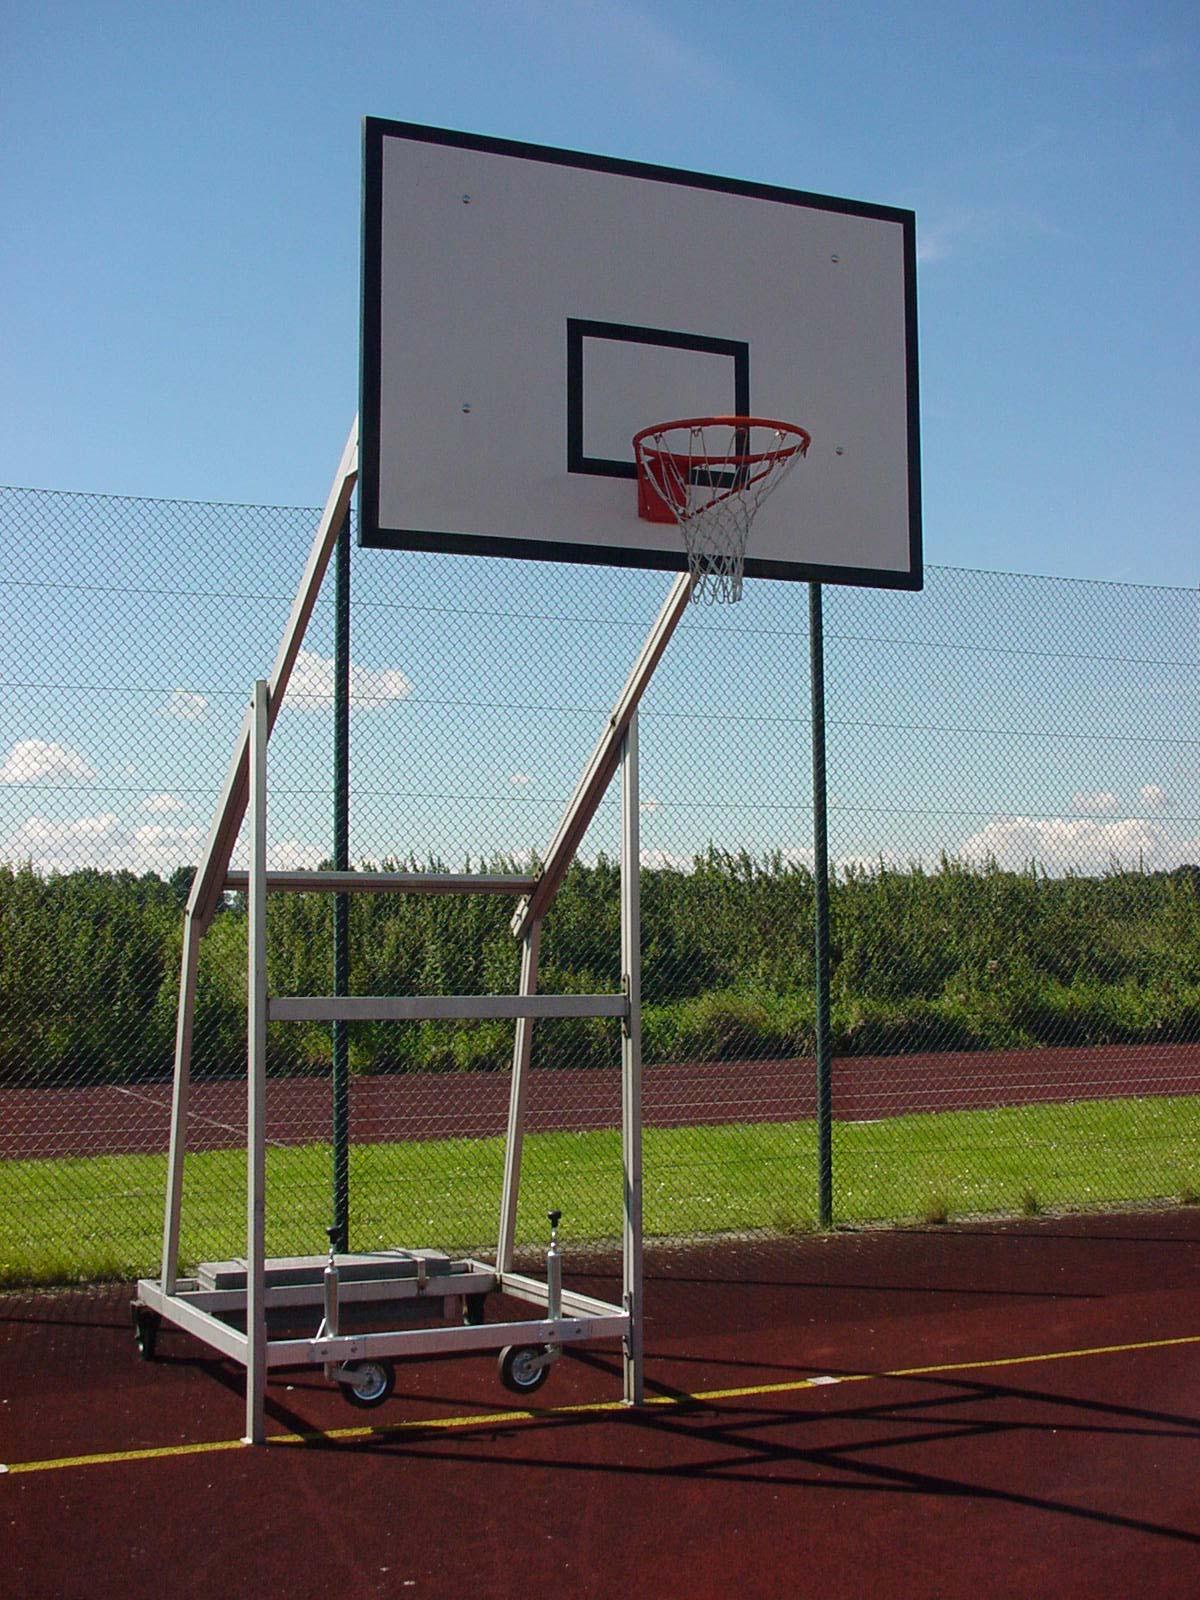 Basketballanlage fahrbar